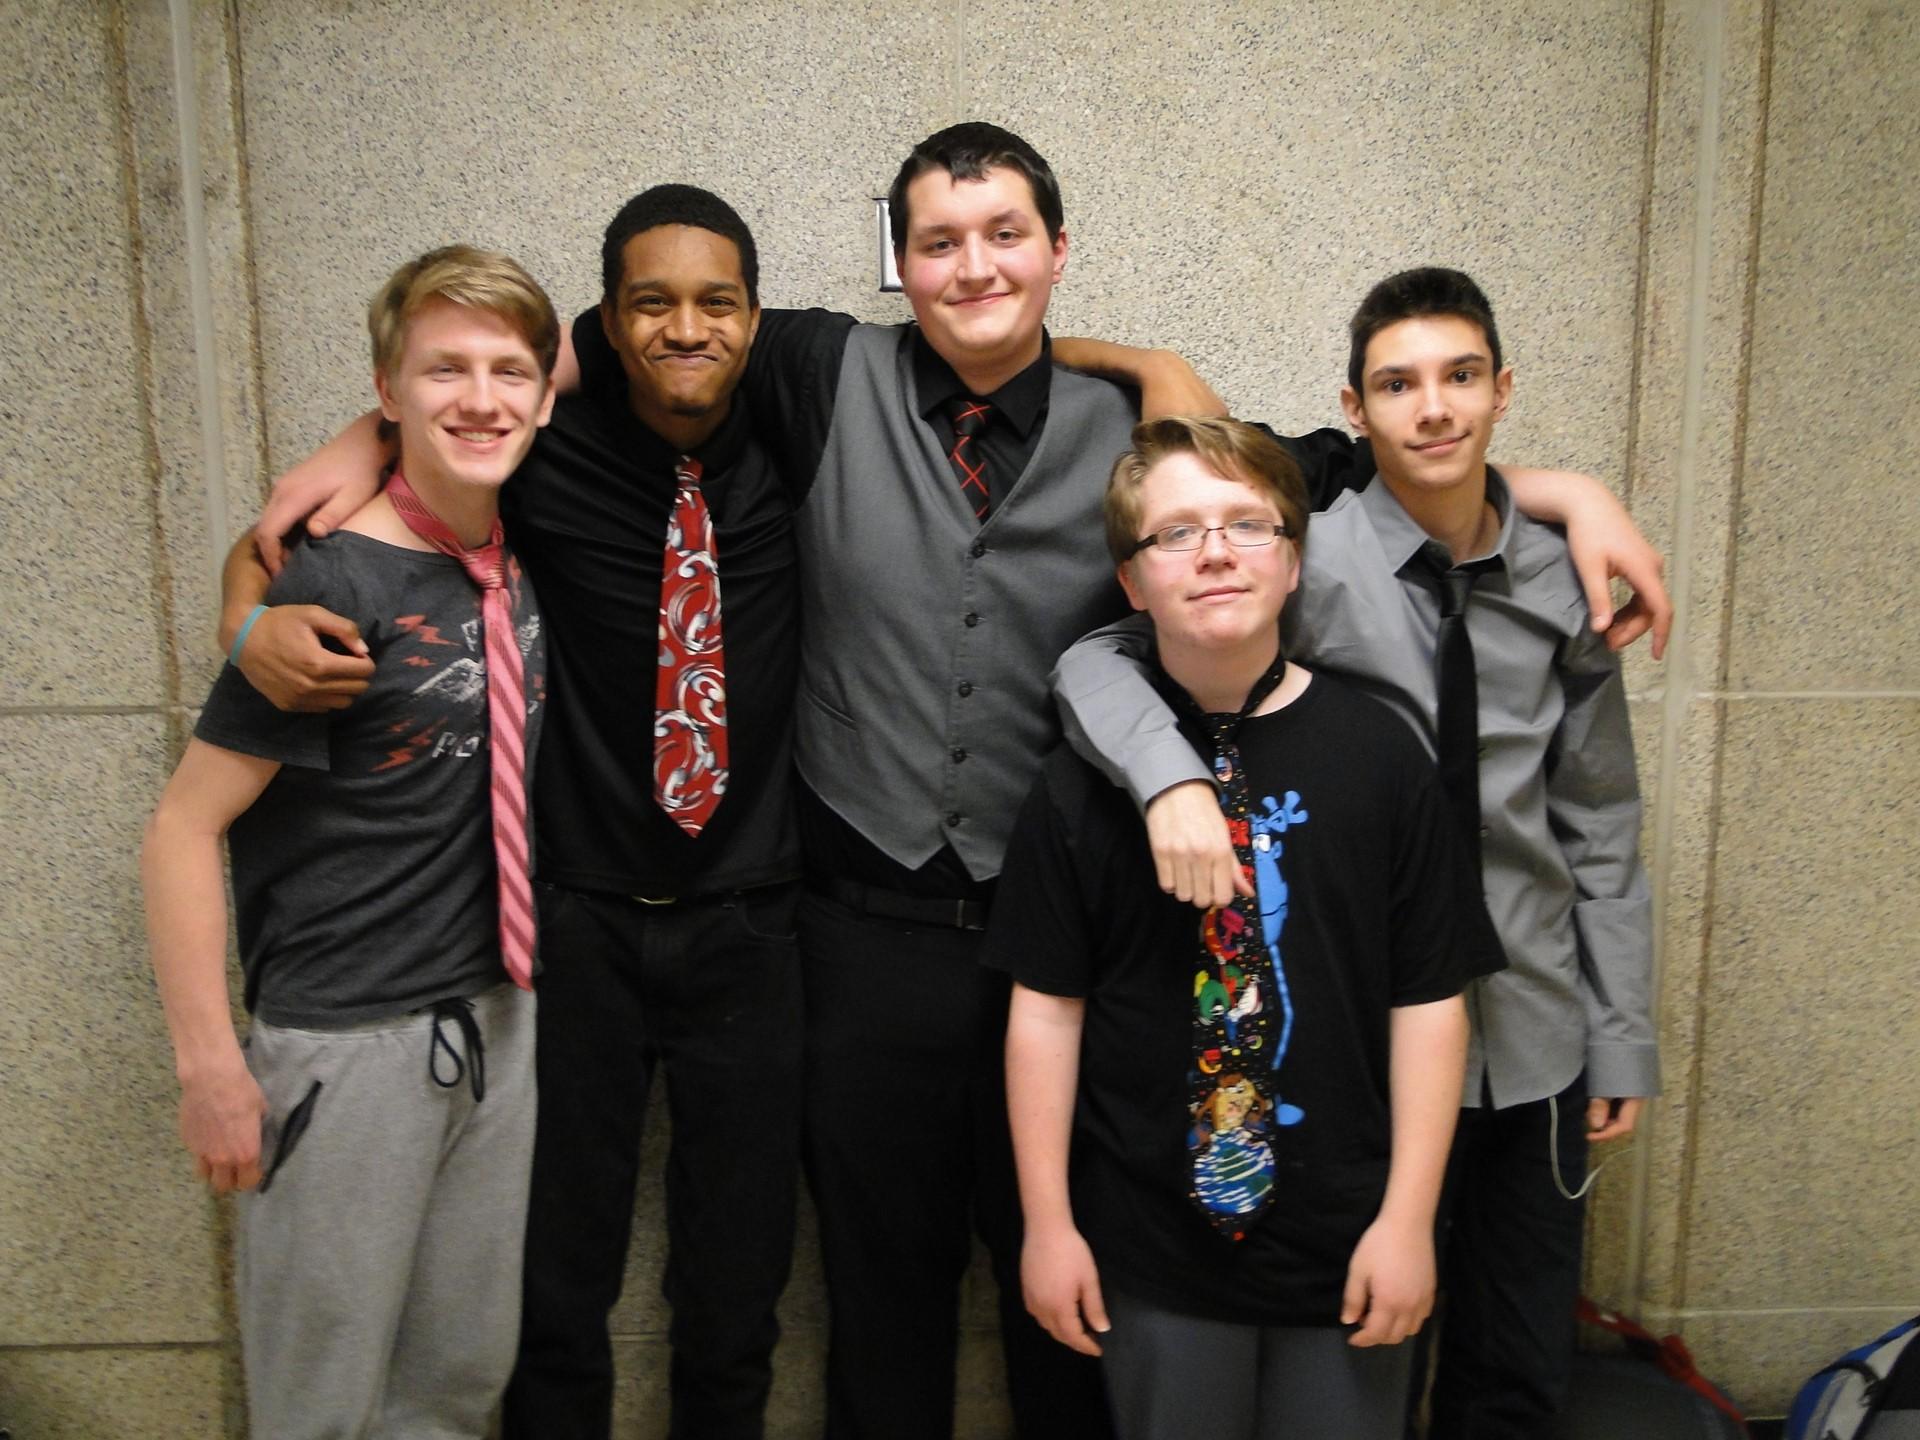 Tie Guys